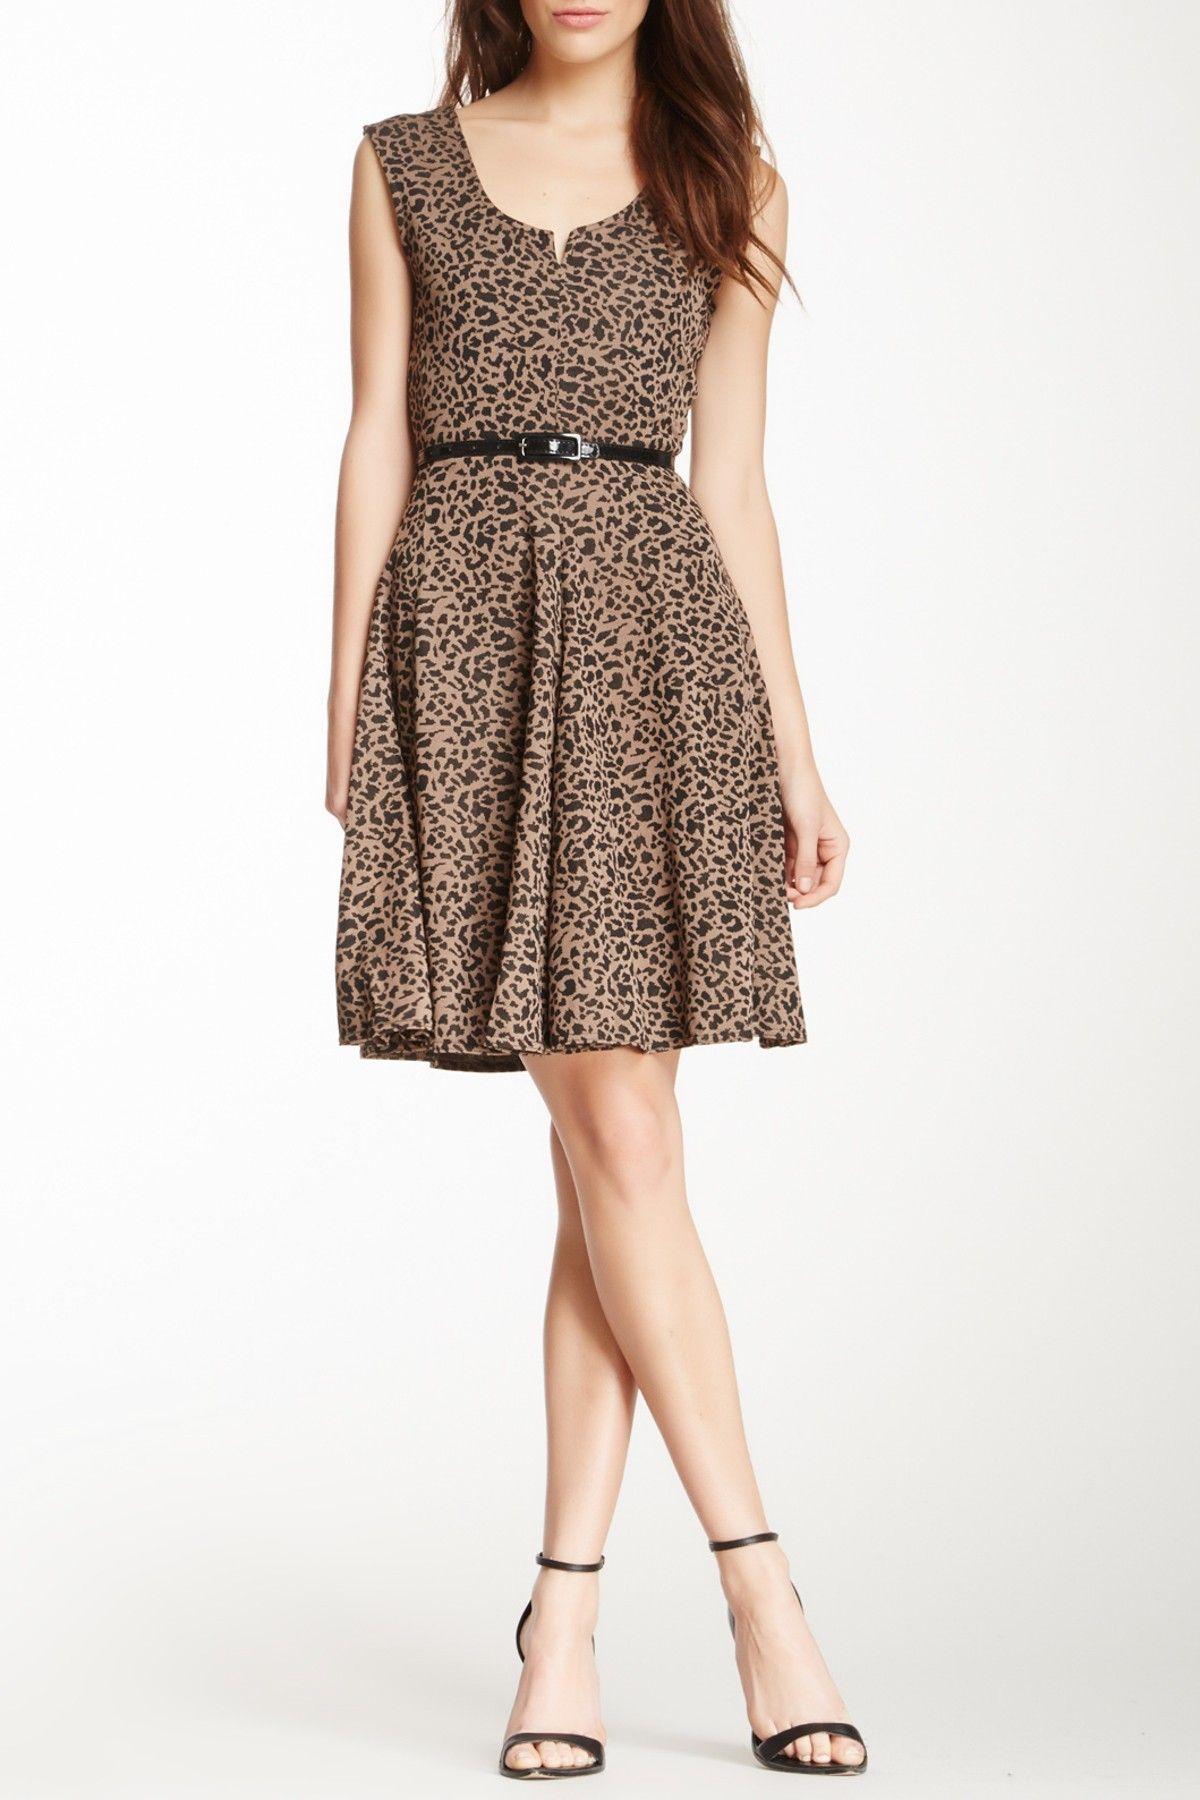 Papillon Belted Animal Print Dress | Animal print dresses